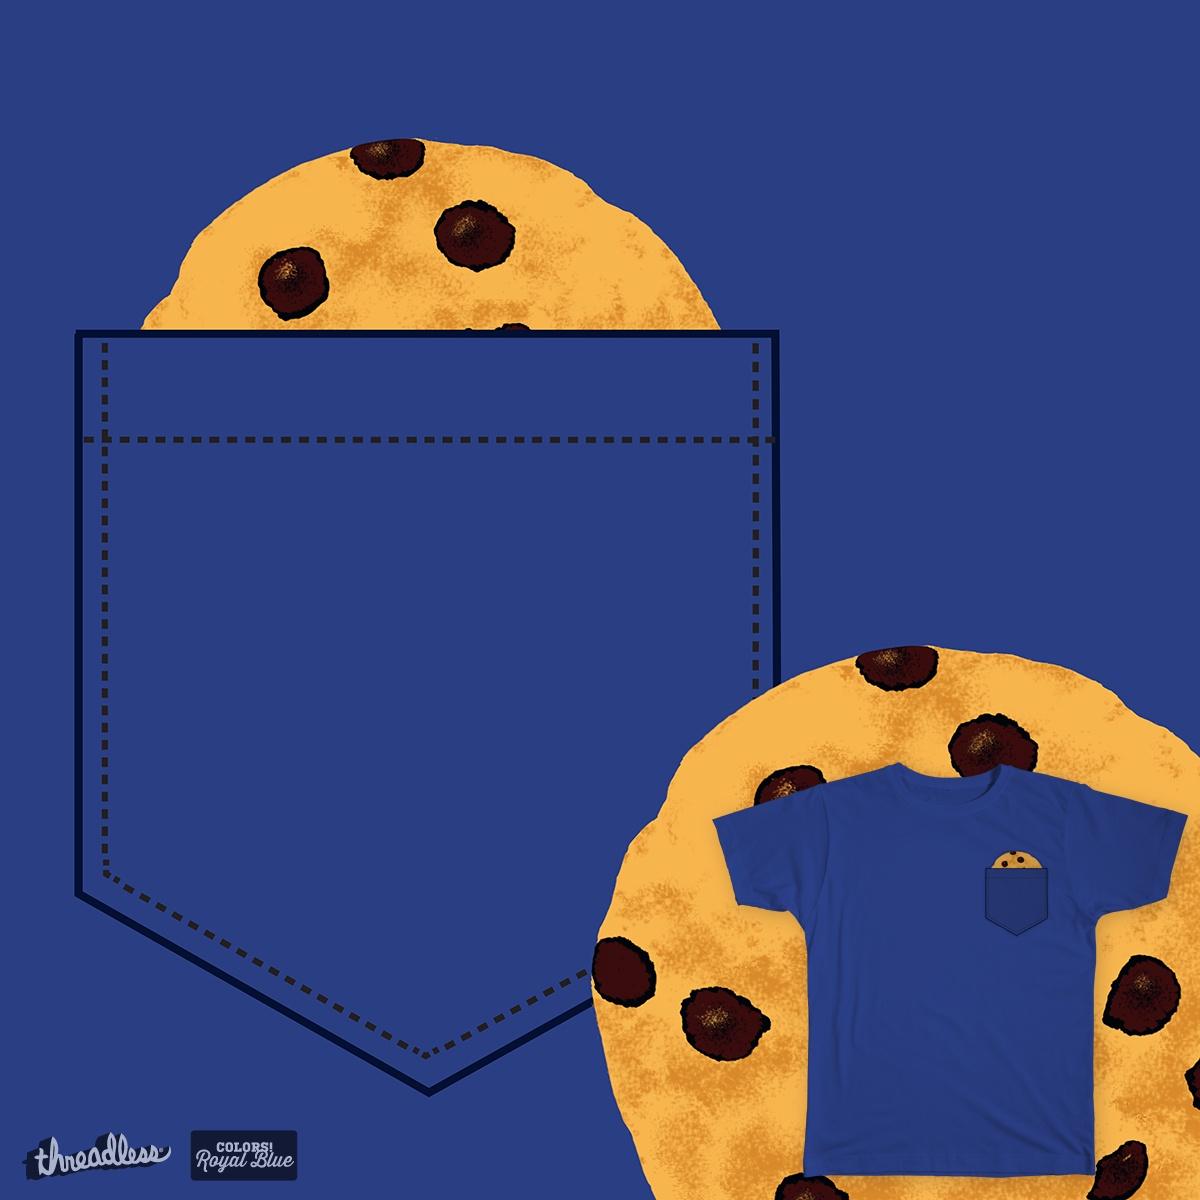 Cookie Monster's Secret Pocket by Ullea on Threadless